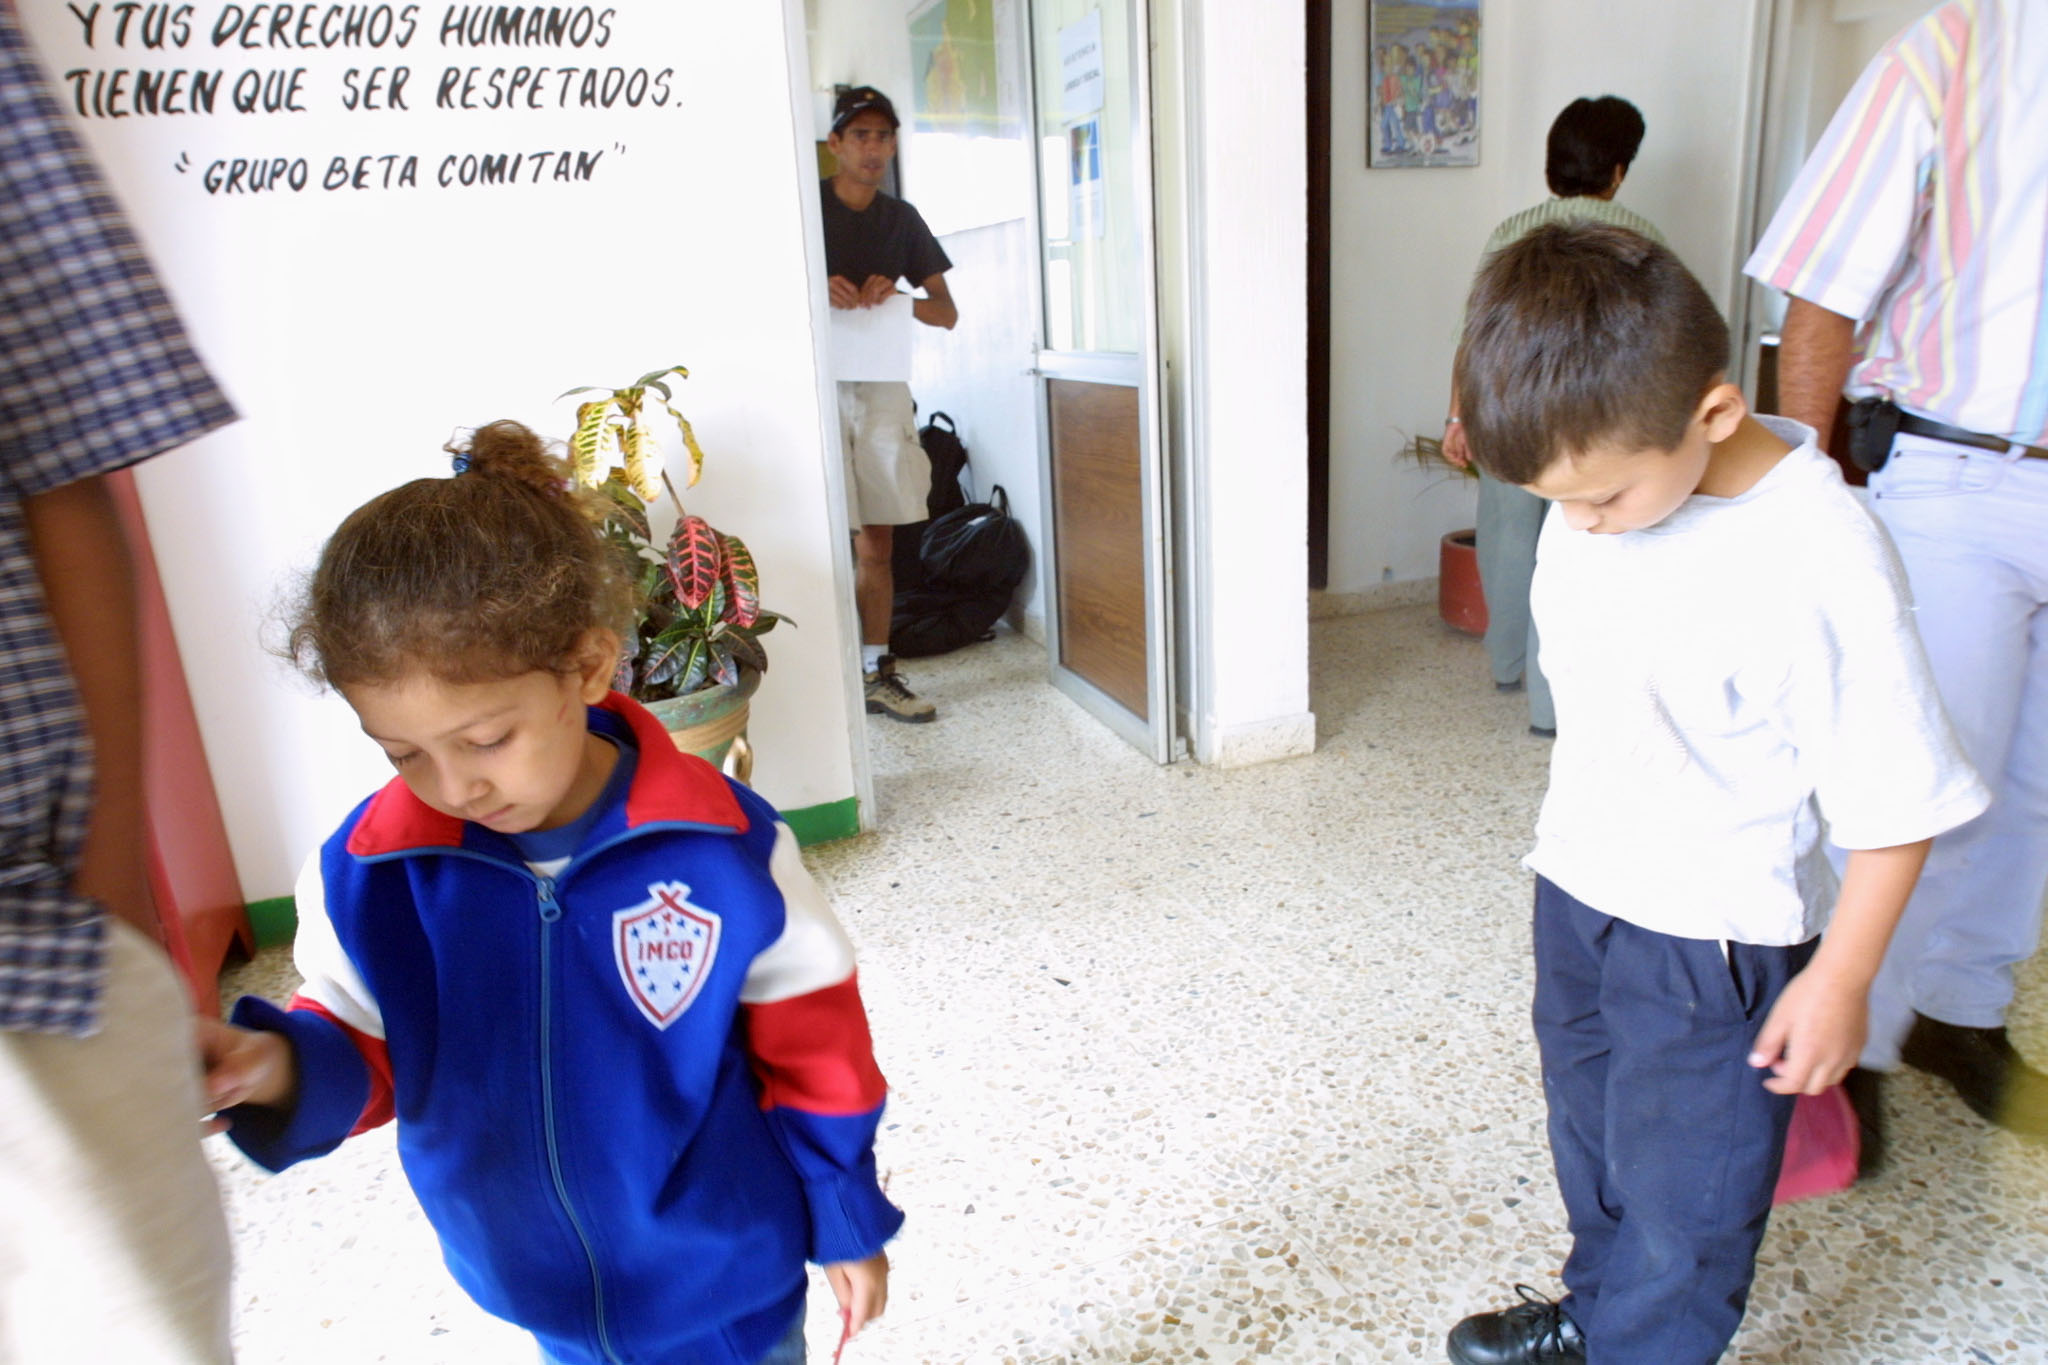 Miigrant children in Chiapas, AFP